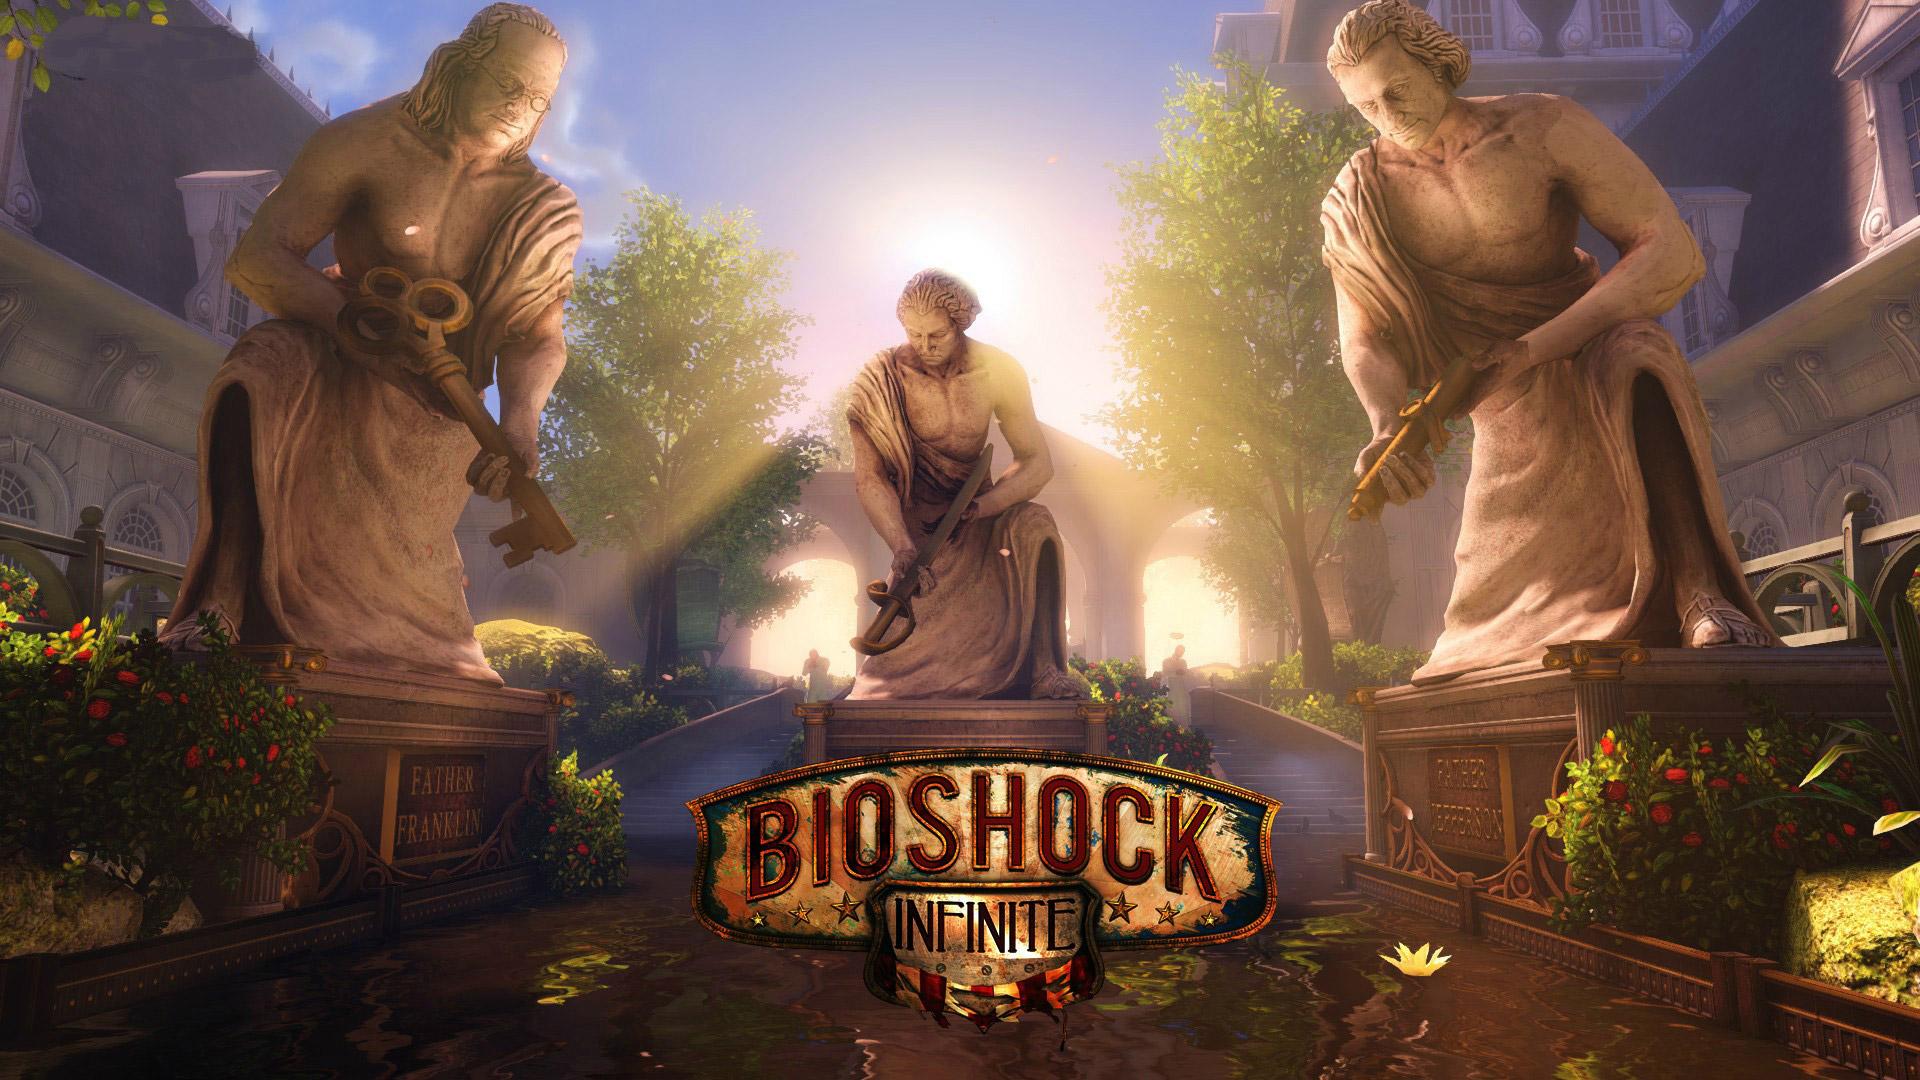 Bioshock Infinite Wallpaper in 1920x1080